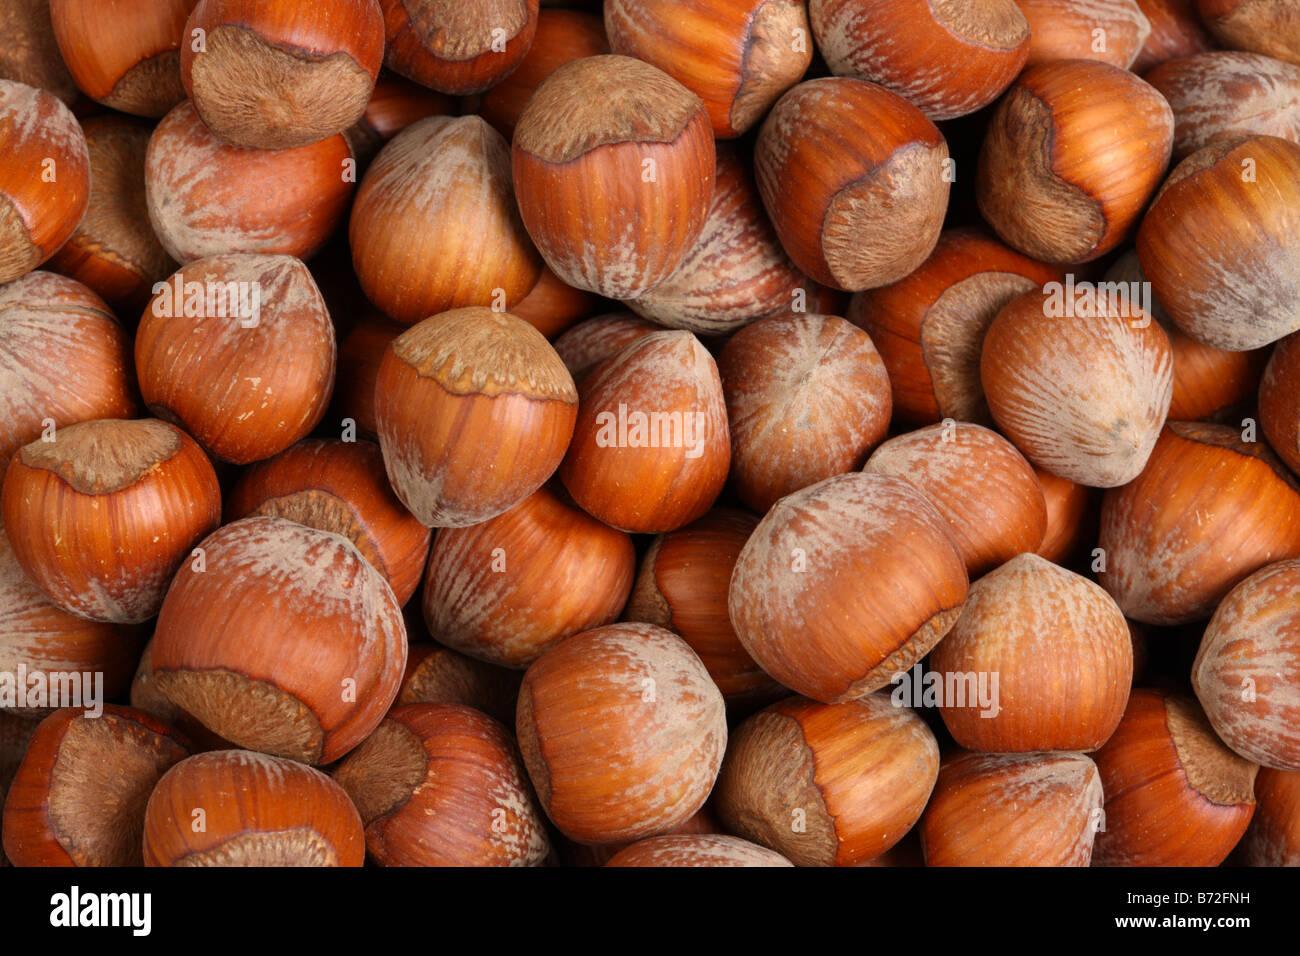 Background texture of hazelnuts - Stock Image